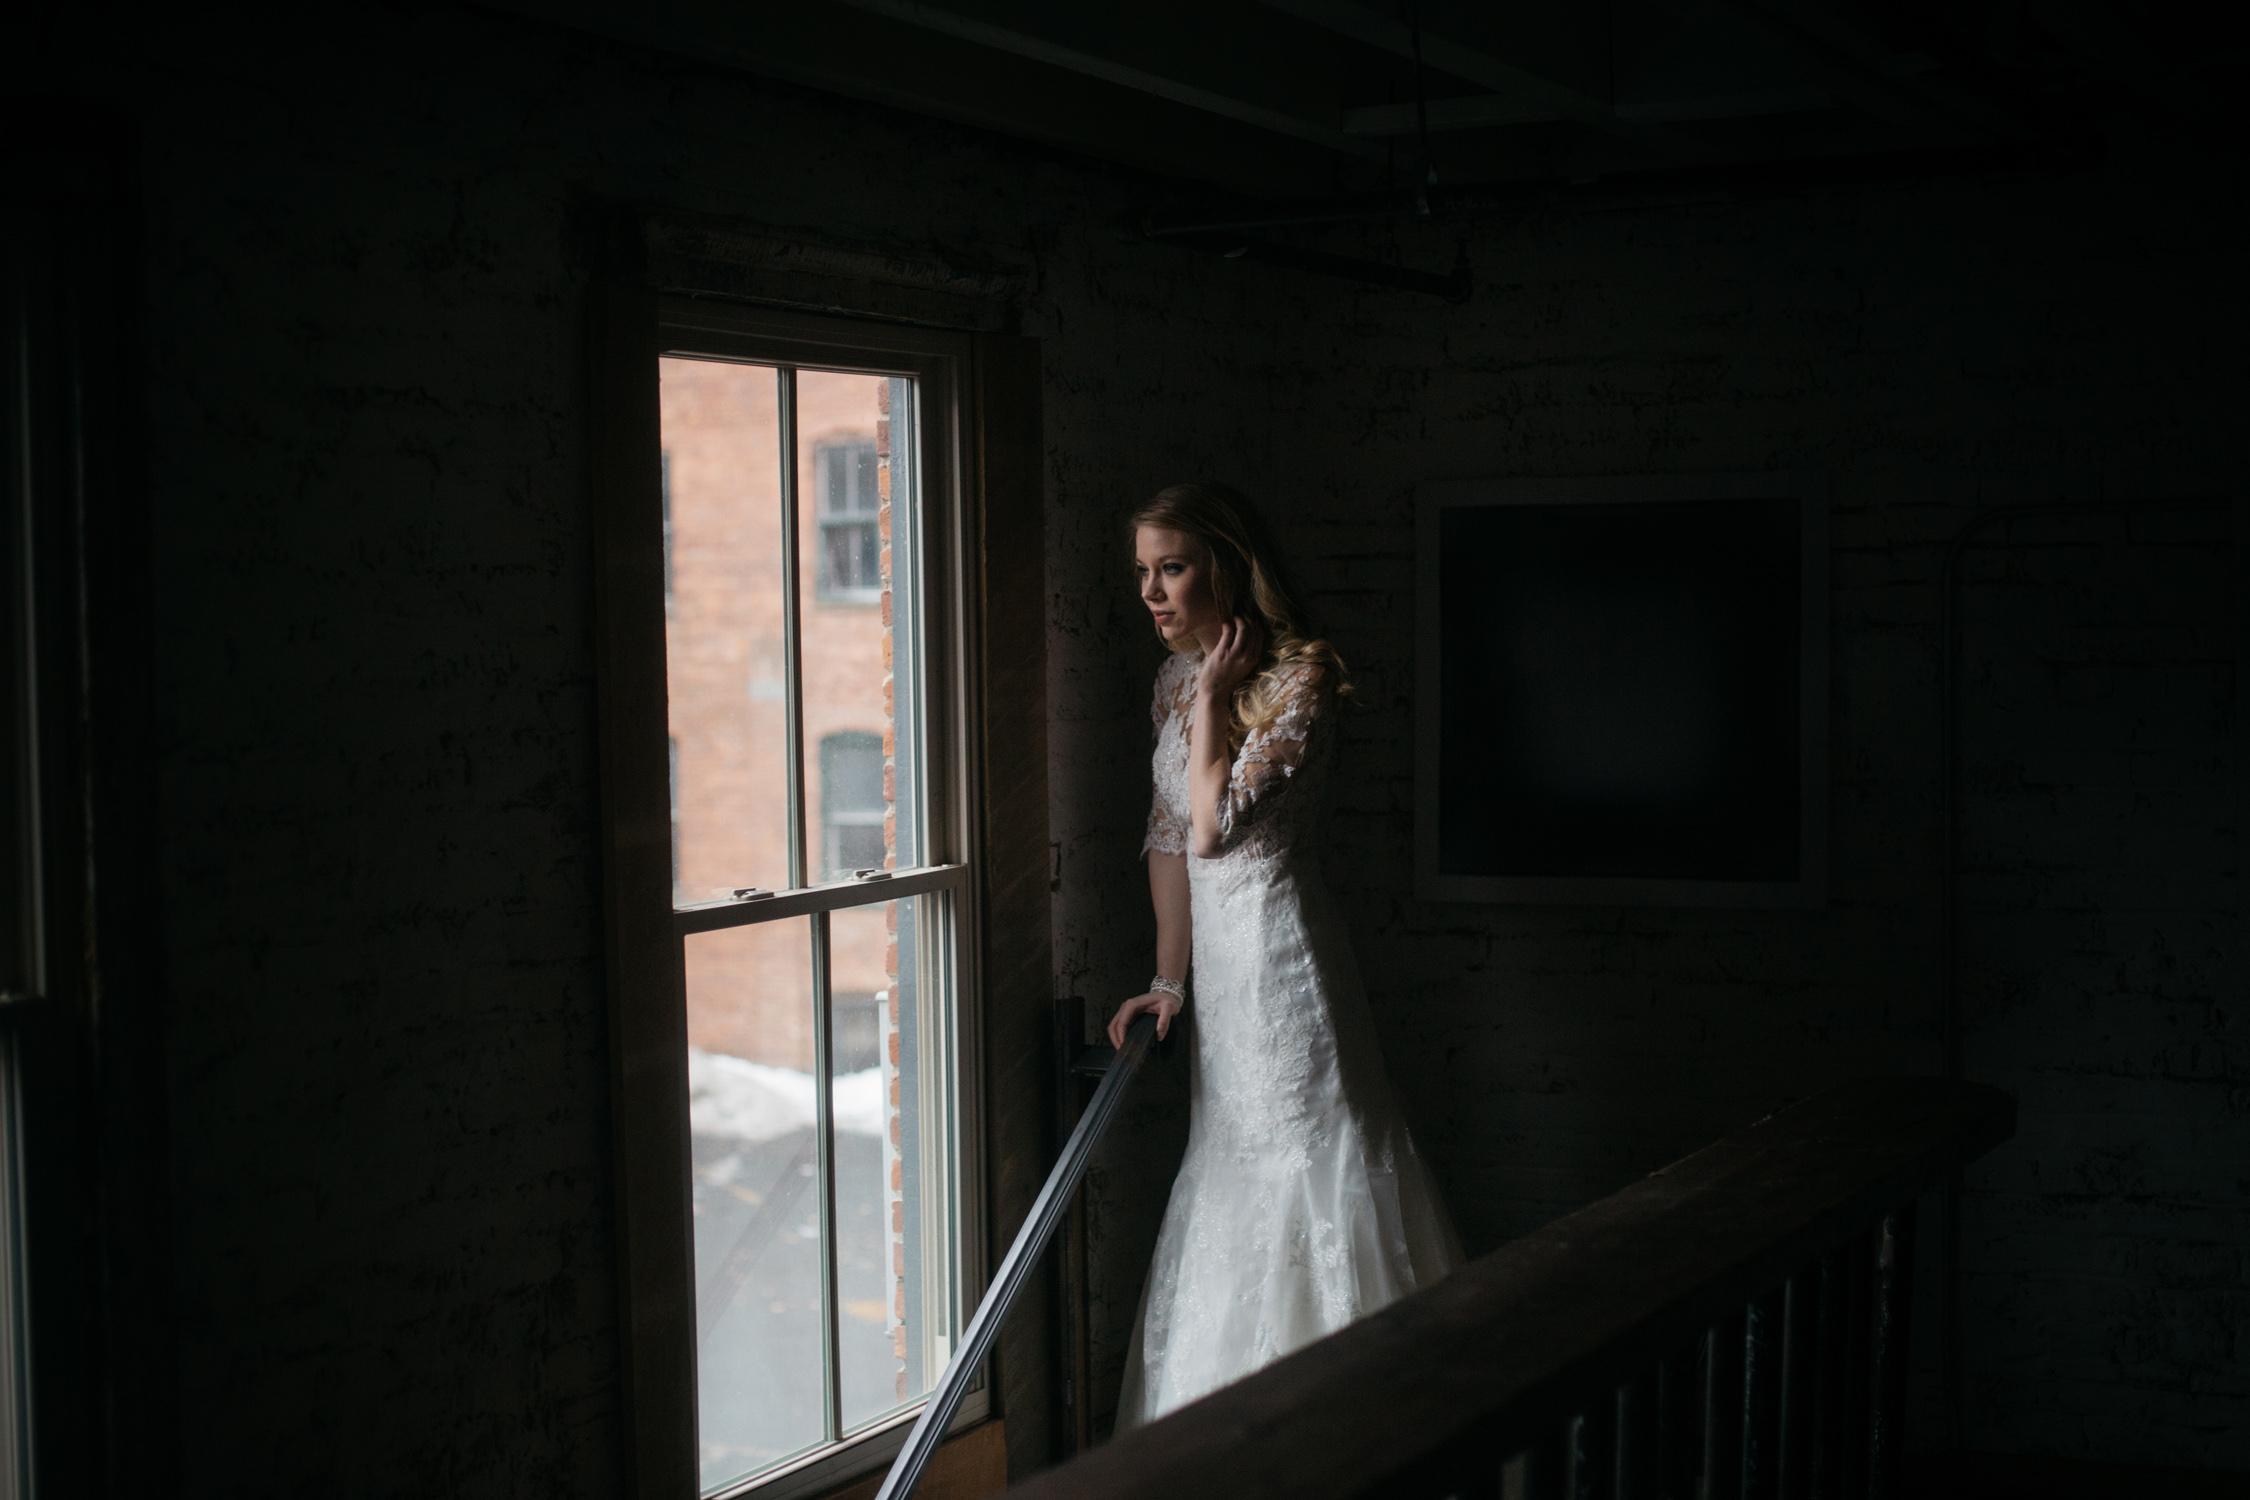 lucas_confectionery_wedding_017.jpg